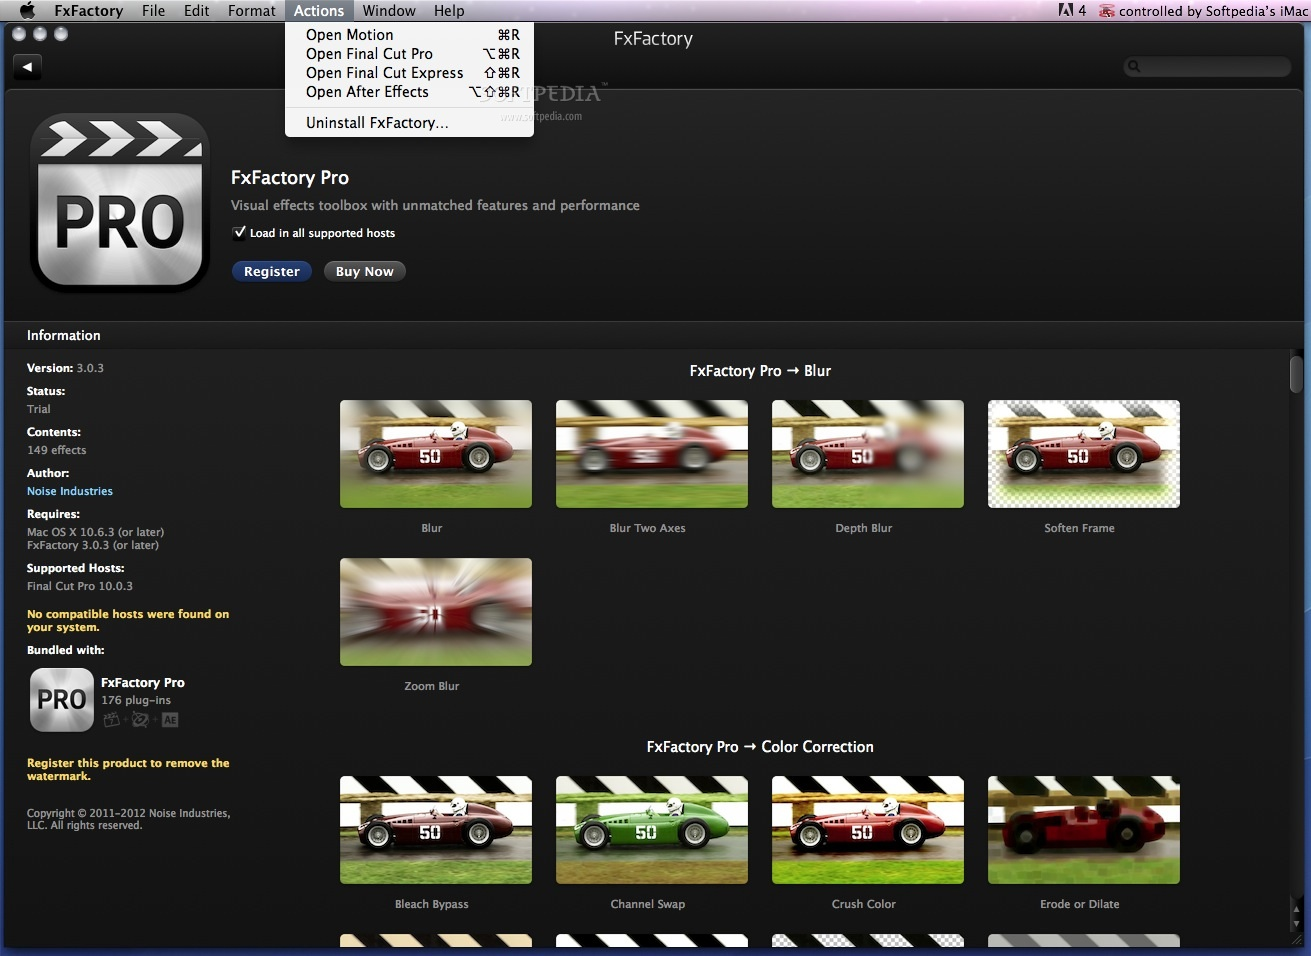 fxfactory pro download